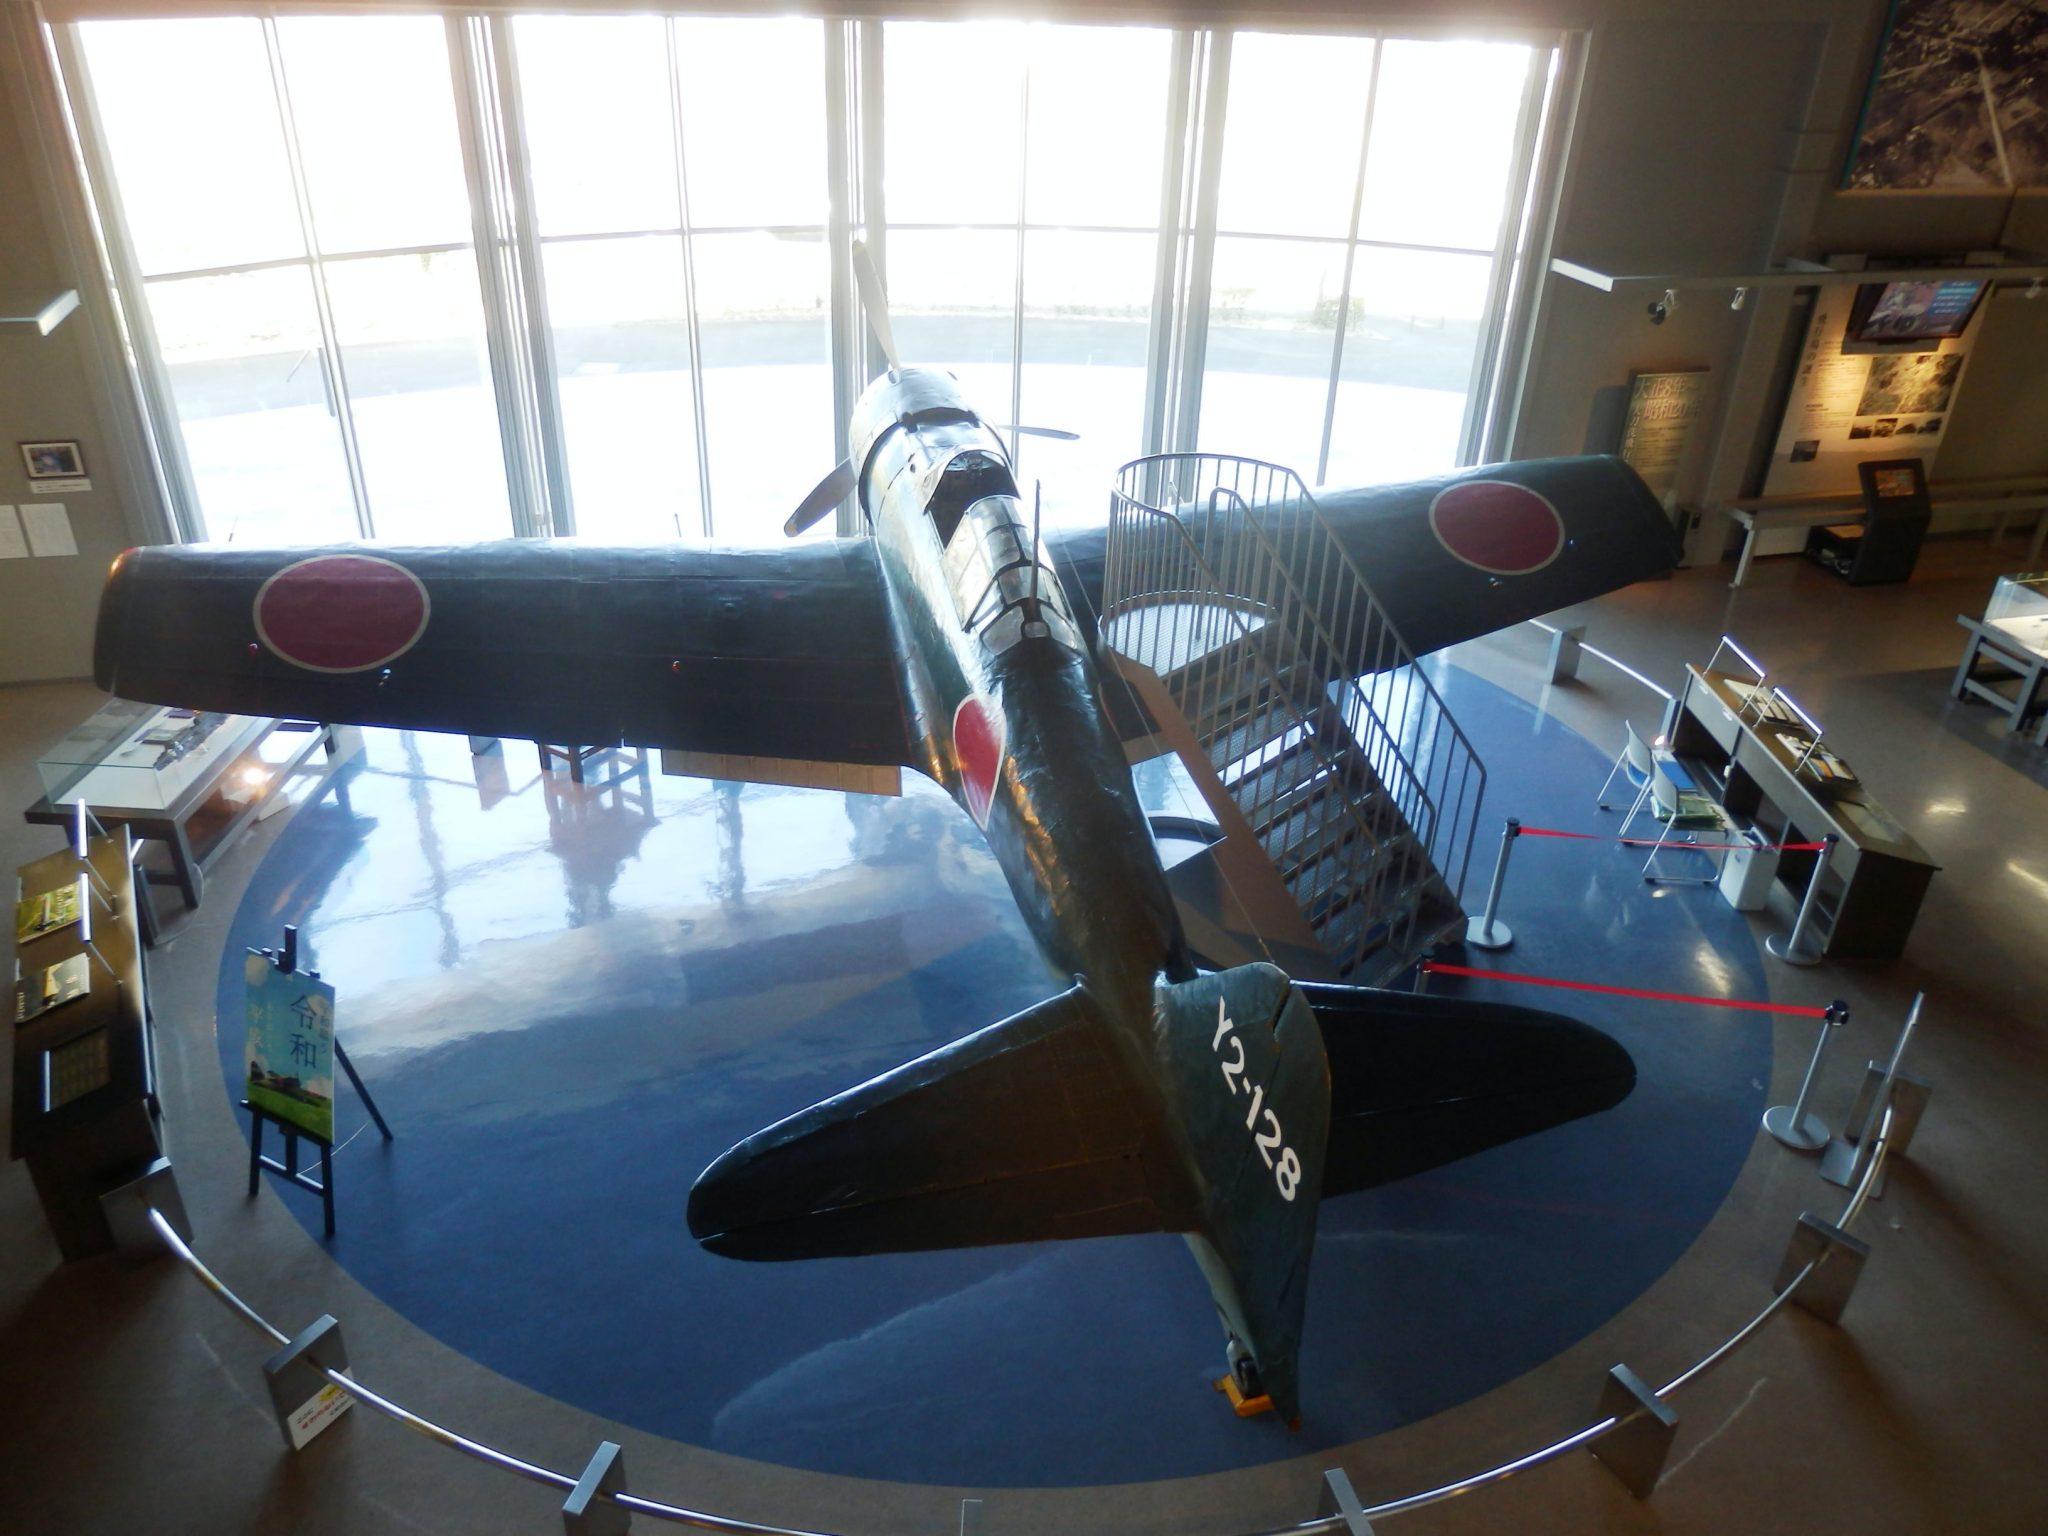 2-Mitsubishi-Zero-airplane-used-for-kamikaze-attacks-at-the-Chikuzenmachi-Tachiarai-Peace-Memorial-Museum-2048x1536.jpg